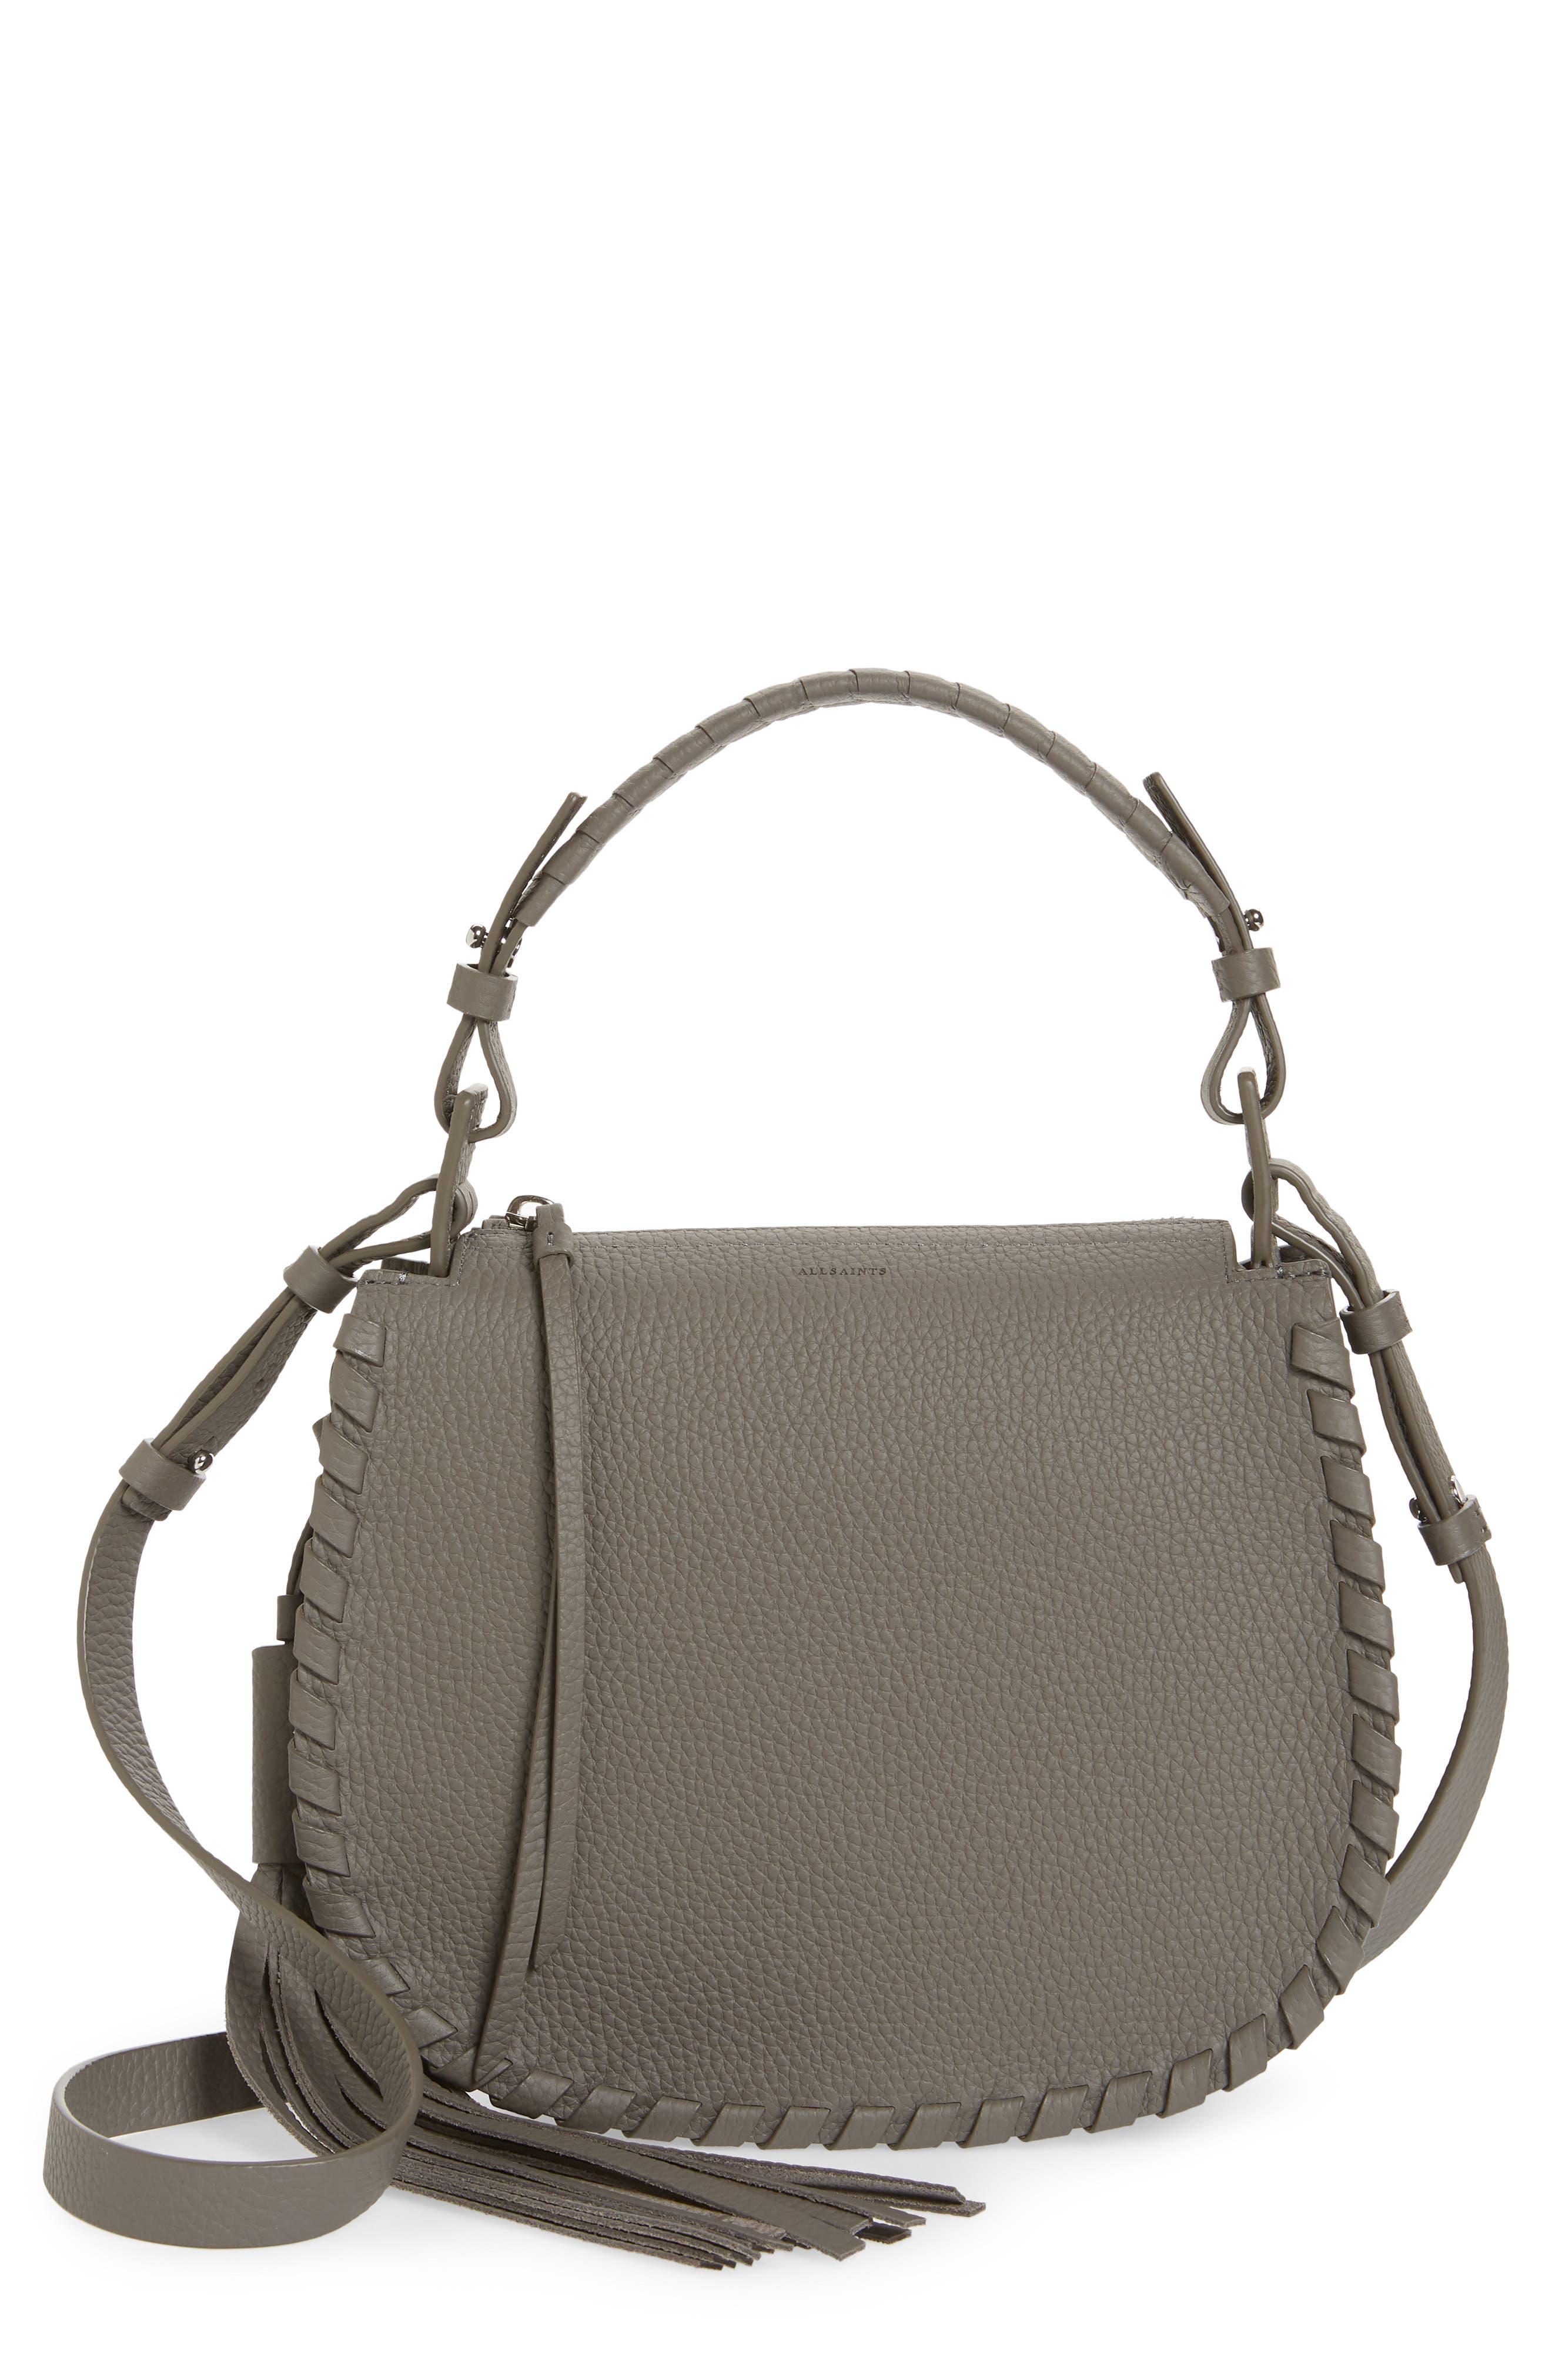 ALLSAINTS, Mori Leather Crossbody Bag, Main thumbnail 1, color, STORM GREY